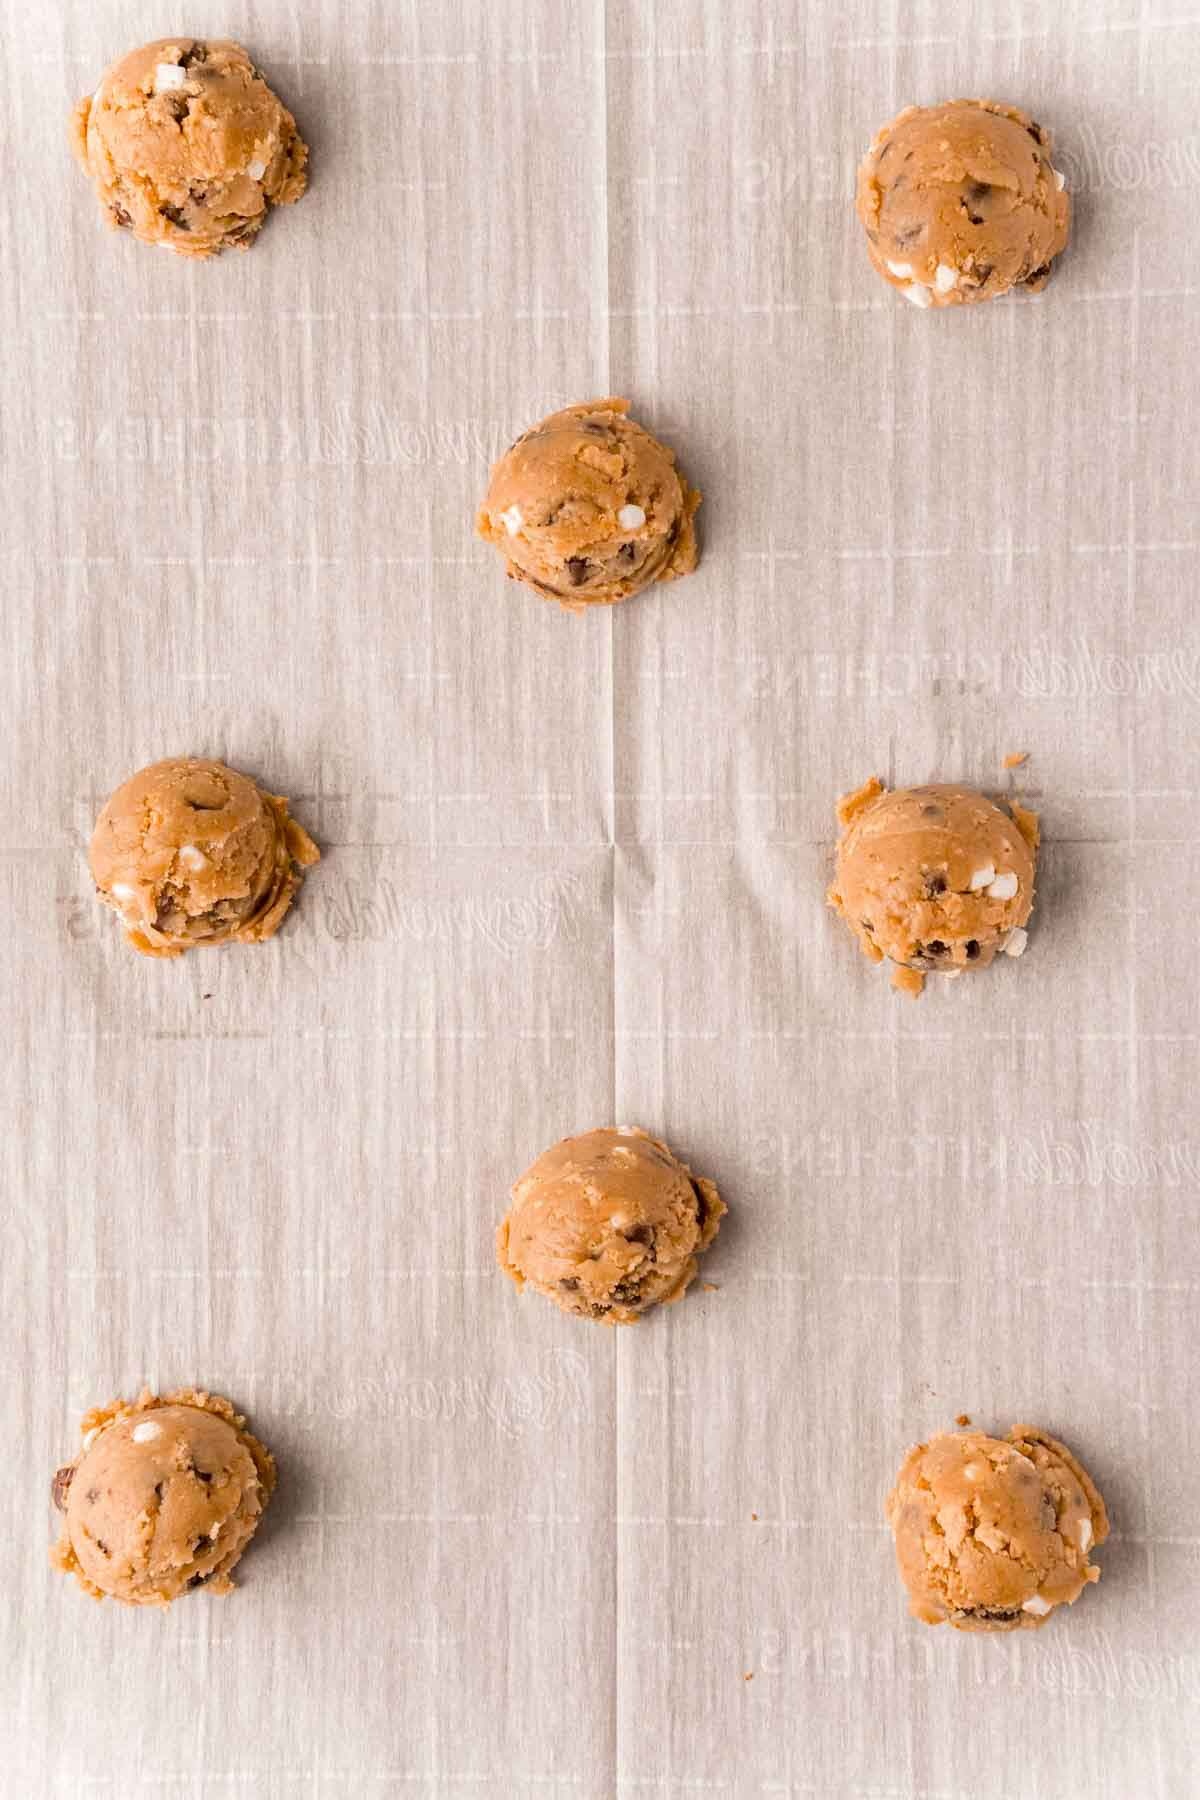 s'more cookie dough balls on a baking sheet